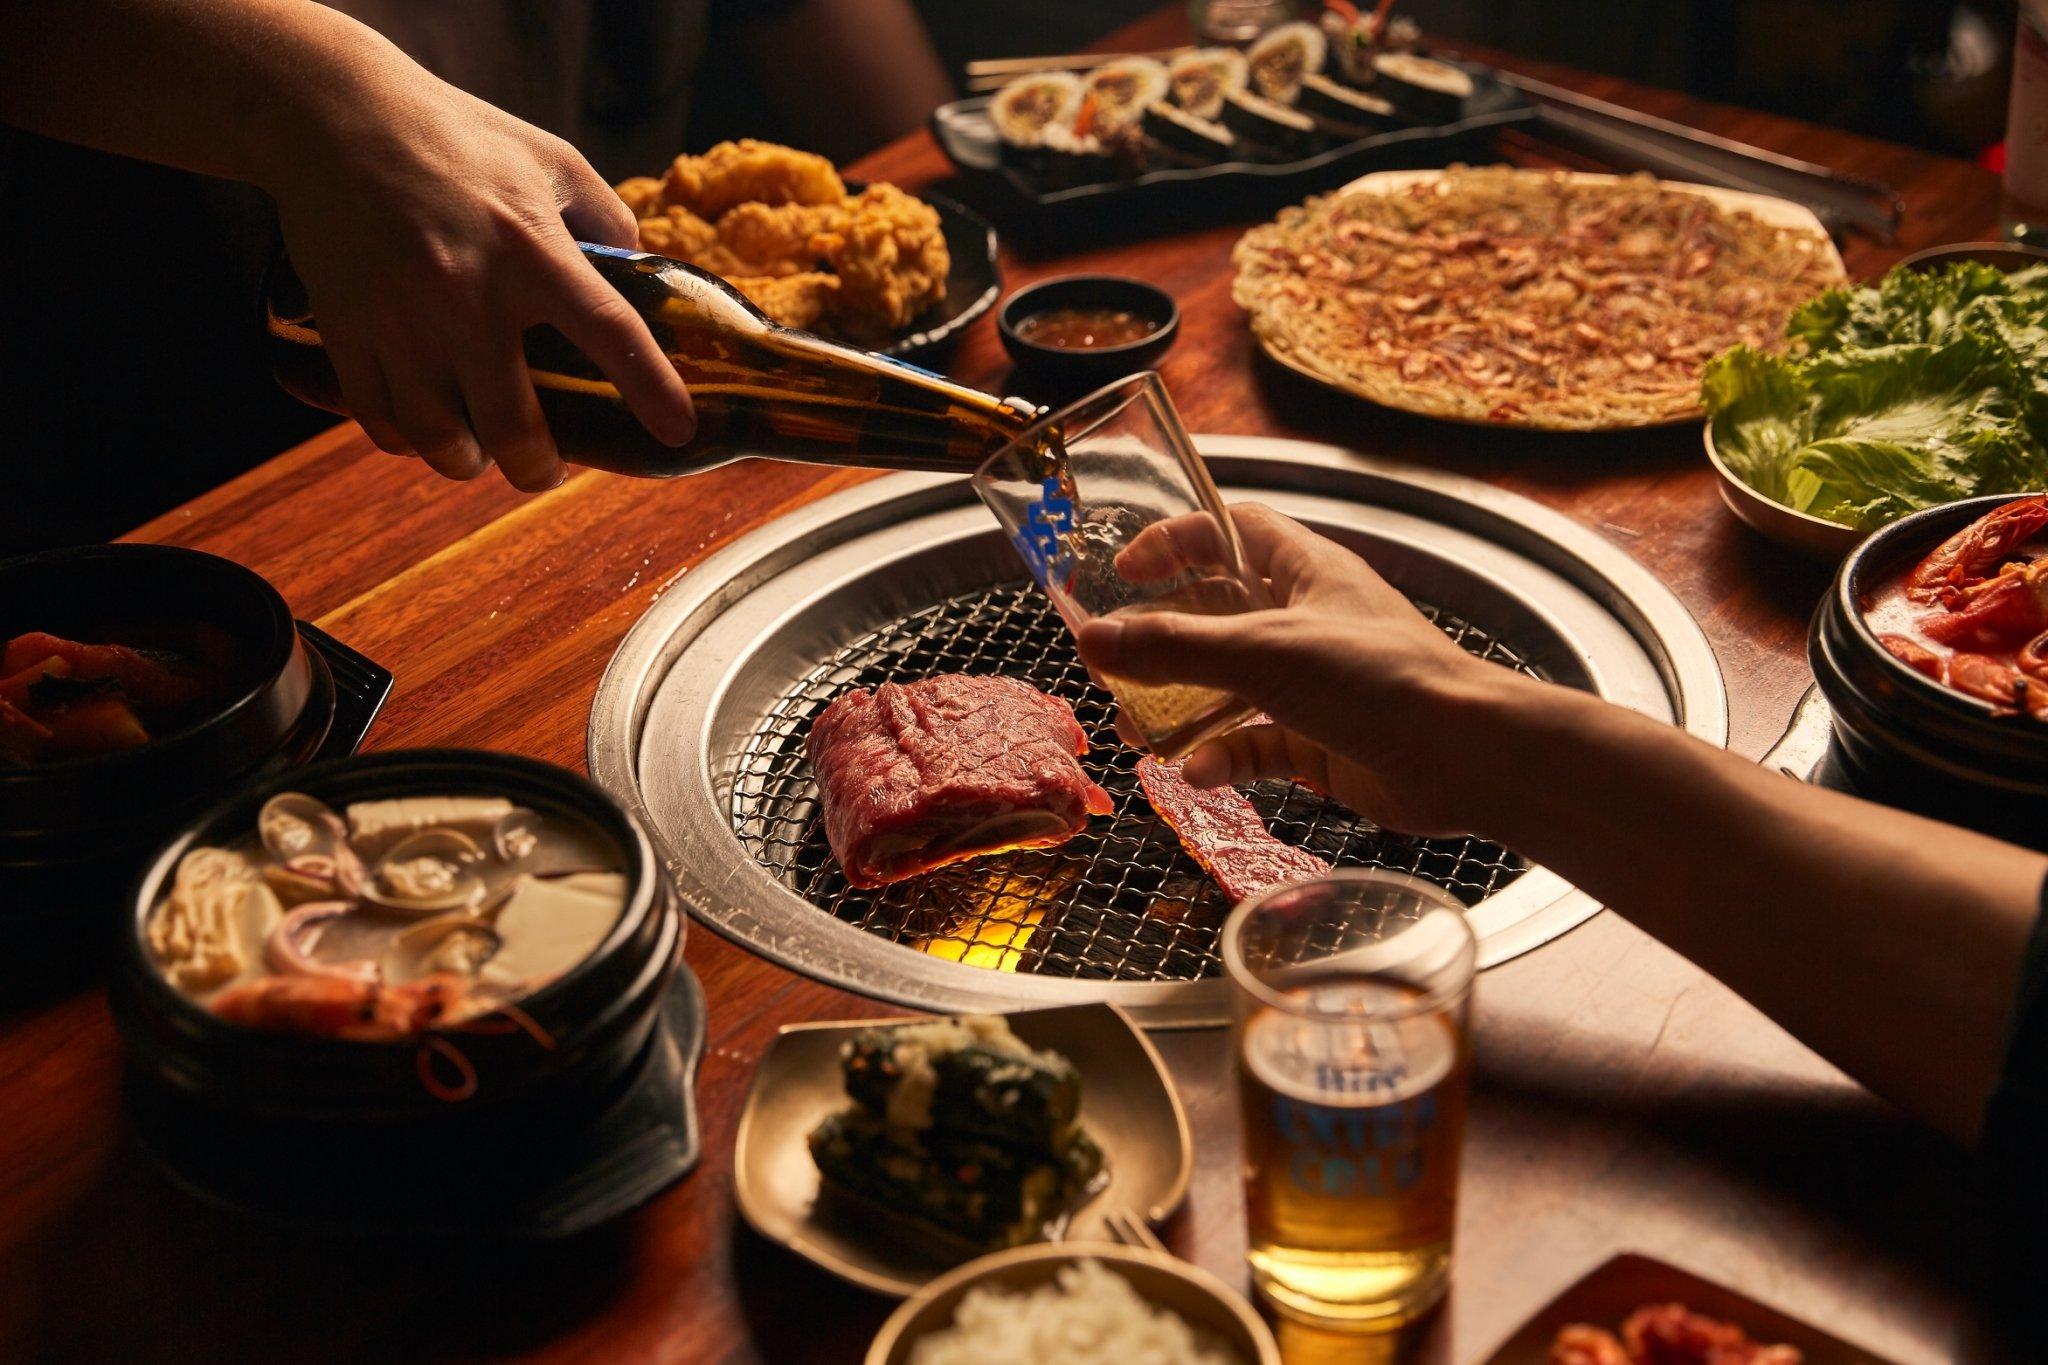 Meat Love 橡木炭火韓國烤肉 信義店-吃肉雙人餐